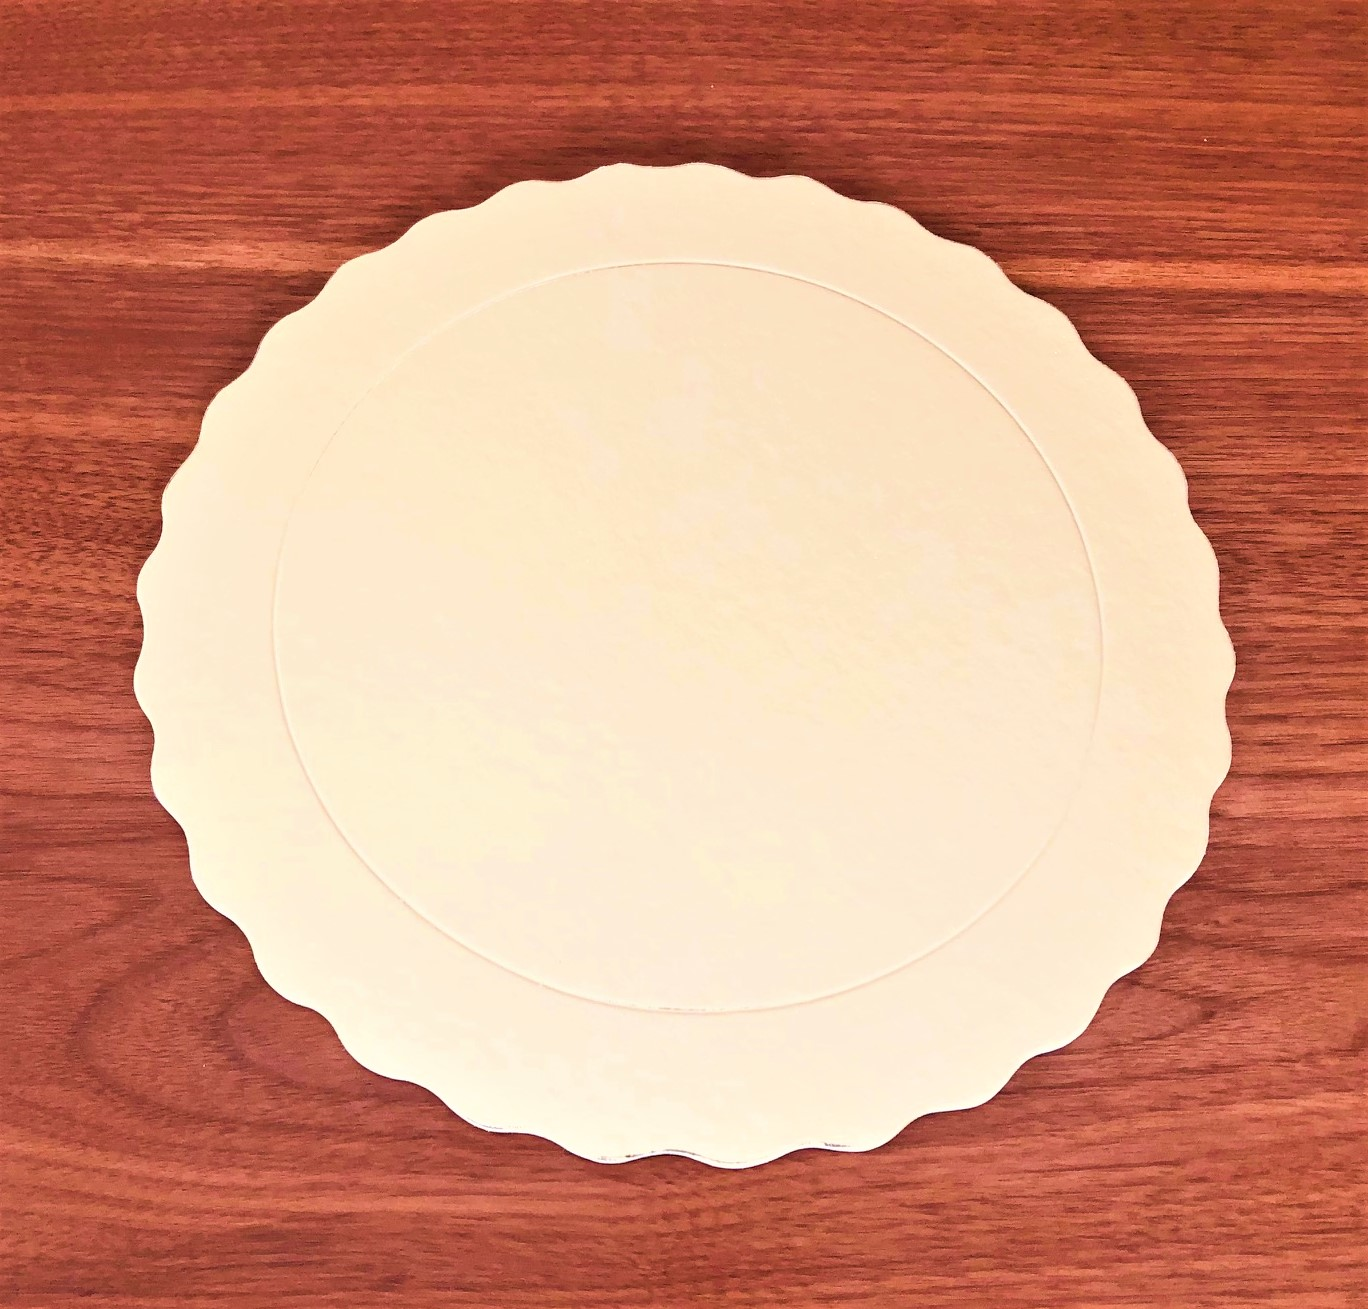 100 Bases Laminadas, Suporte P/ Bolo, Cake Board, 38cm - Ouro